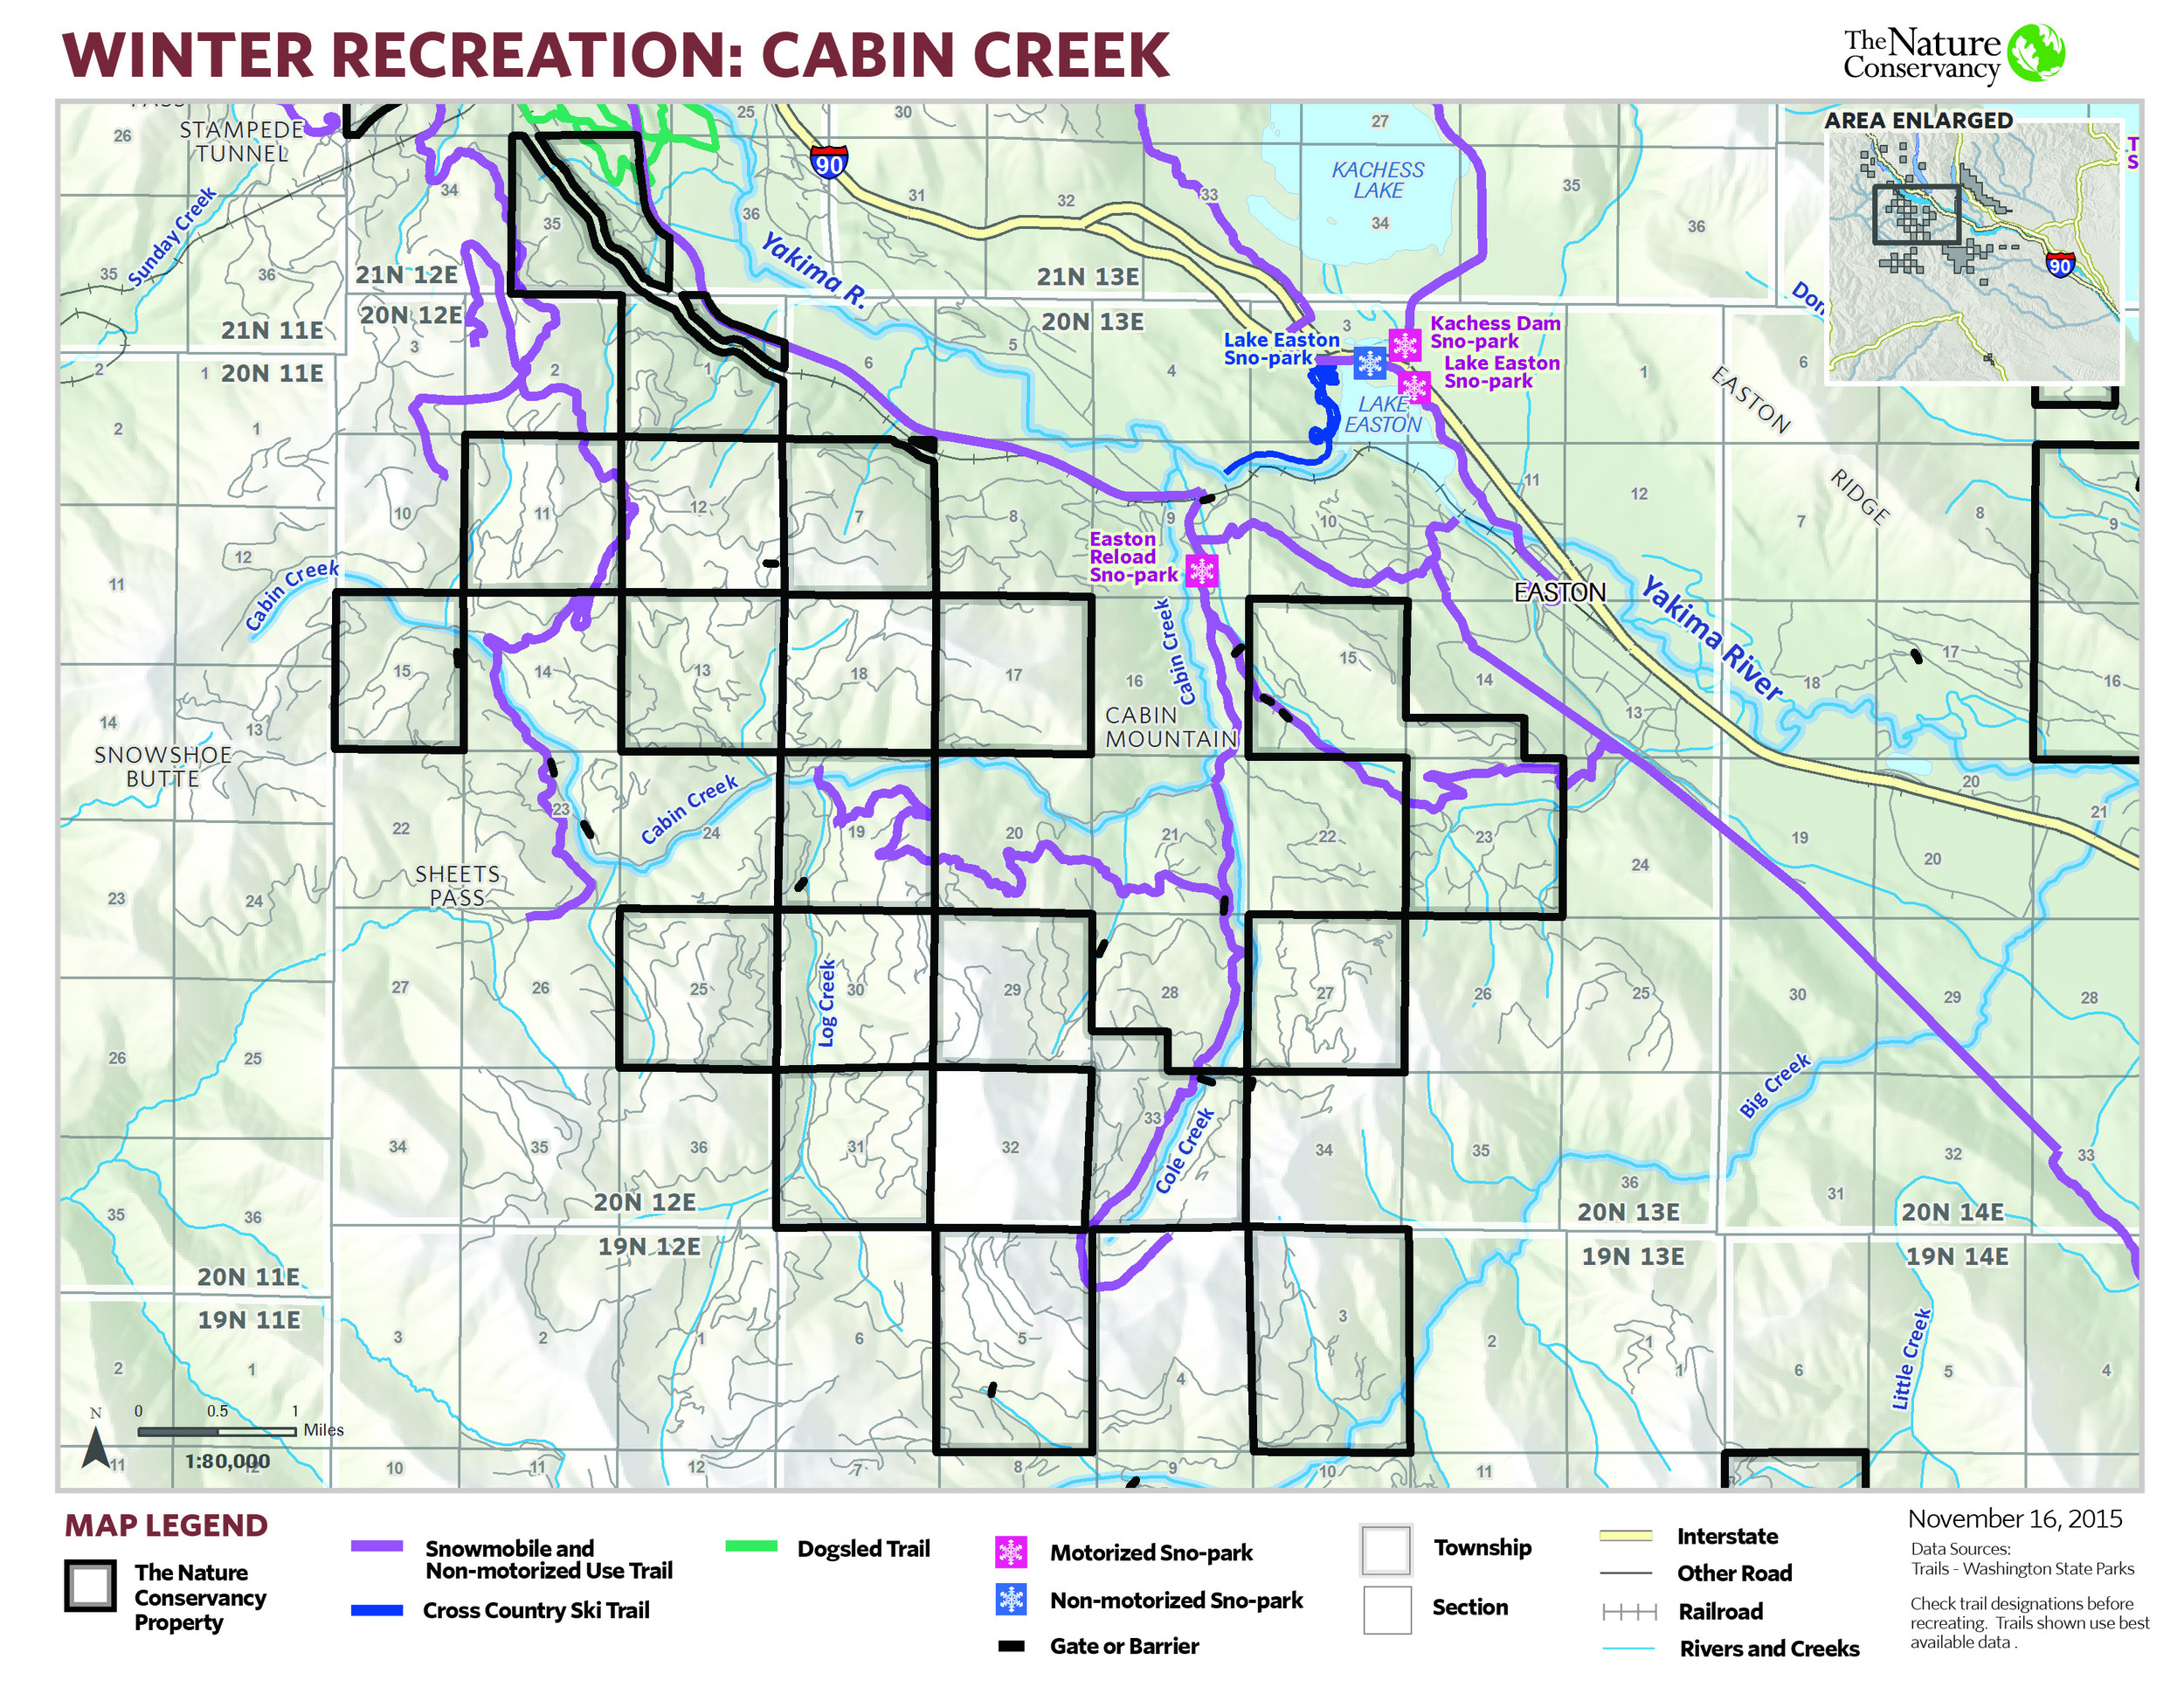 FFOF_CentralCascades_Recreation_Winter_Cabin_20151116.jpg